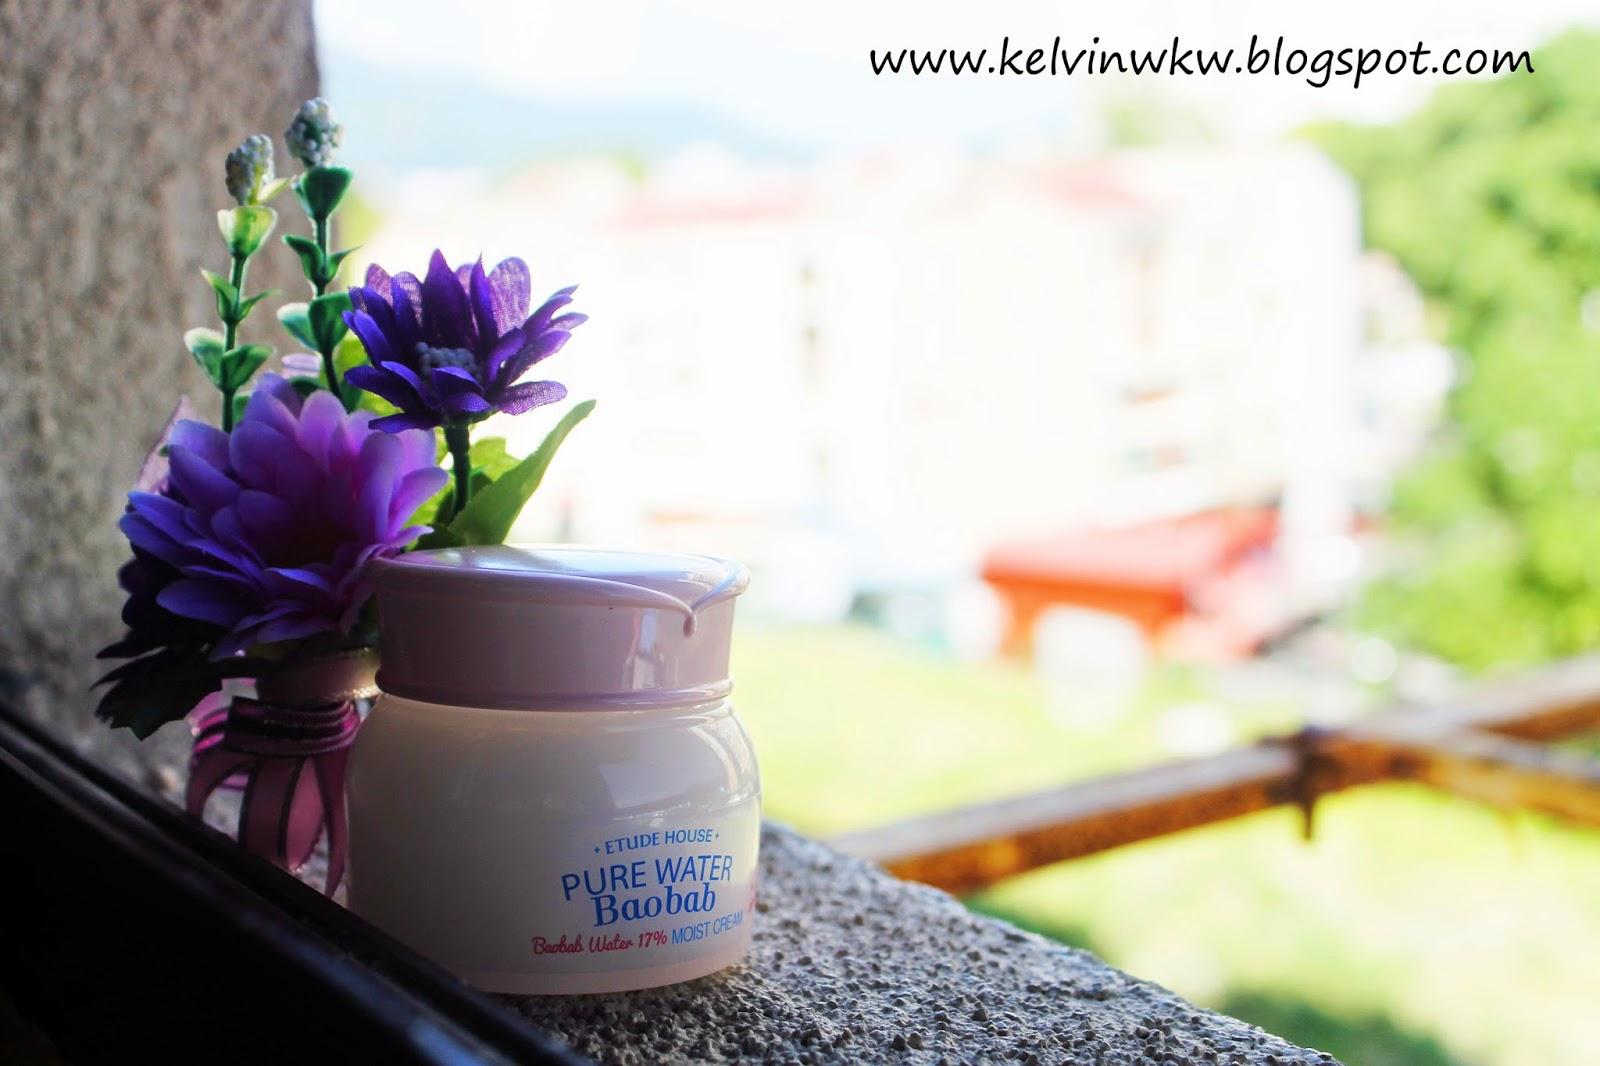 ETUDE HOUSE Pure Water Baobab Cream, Baobab Water 17% Moist Cream Glo Skin Beauty Fill Perfecting Primer - 7ml/0.24oz